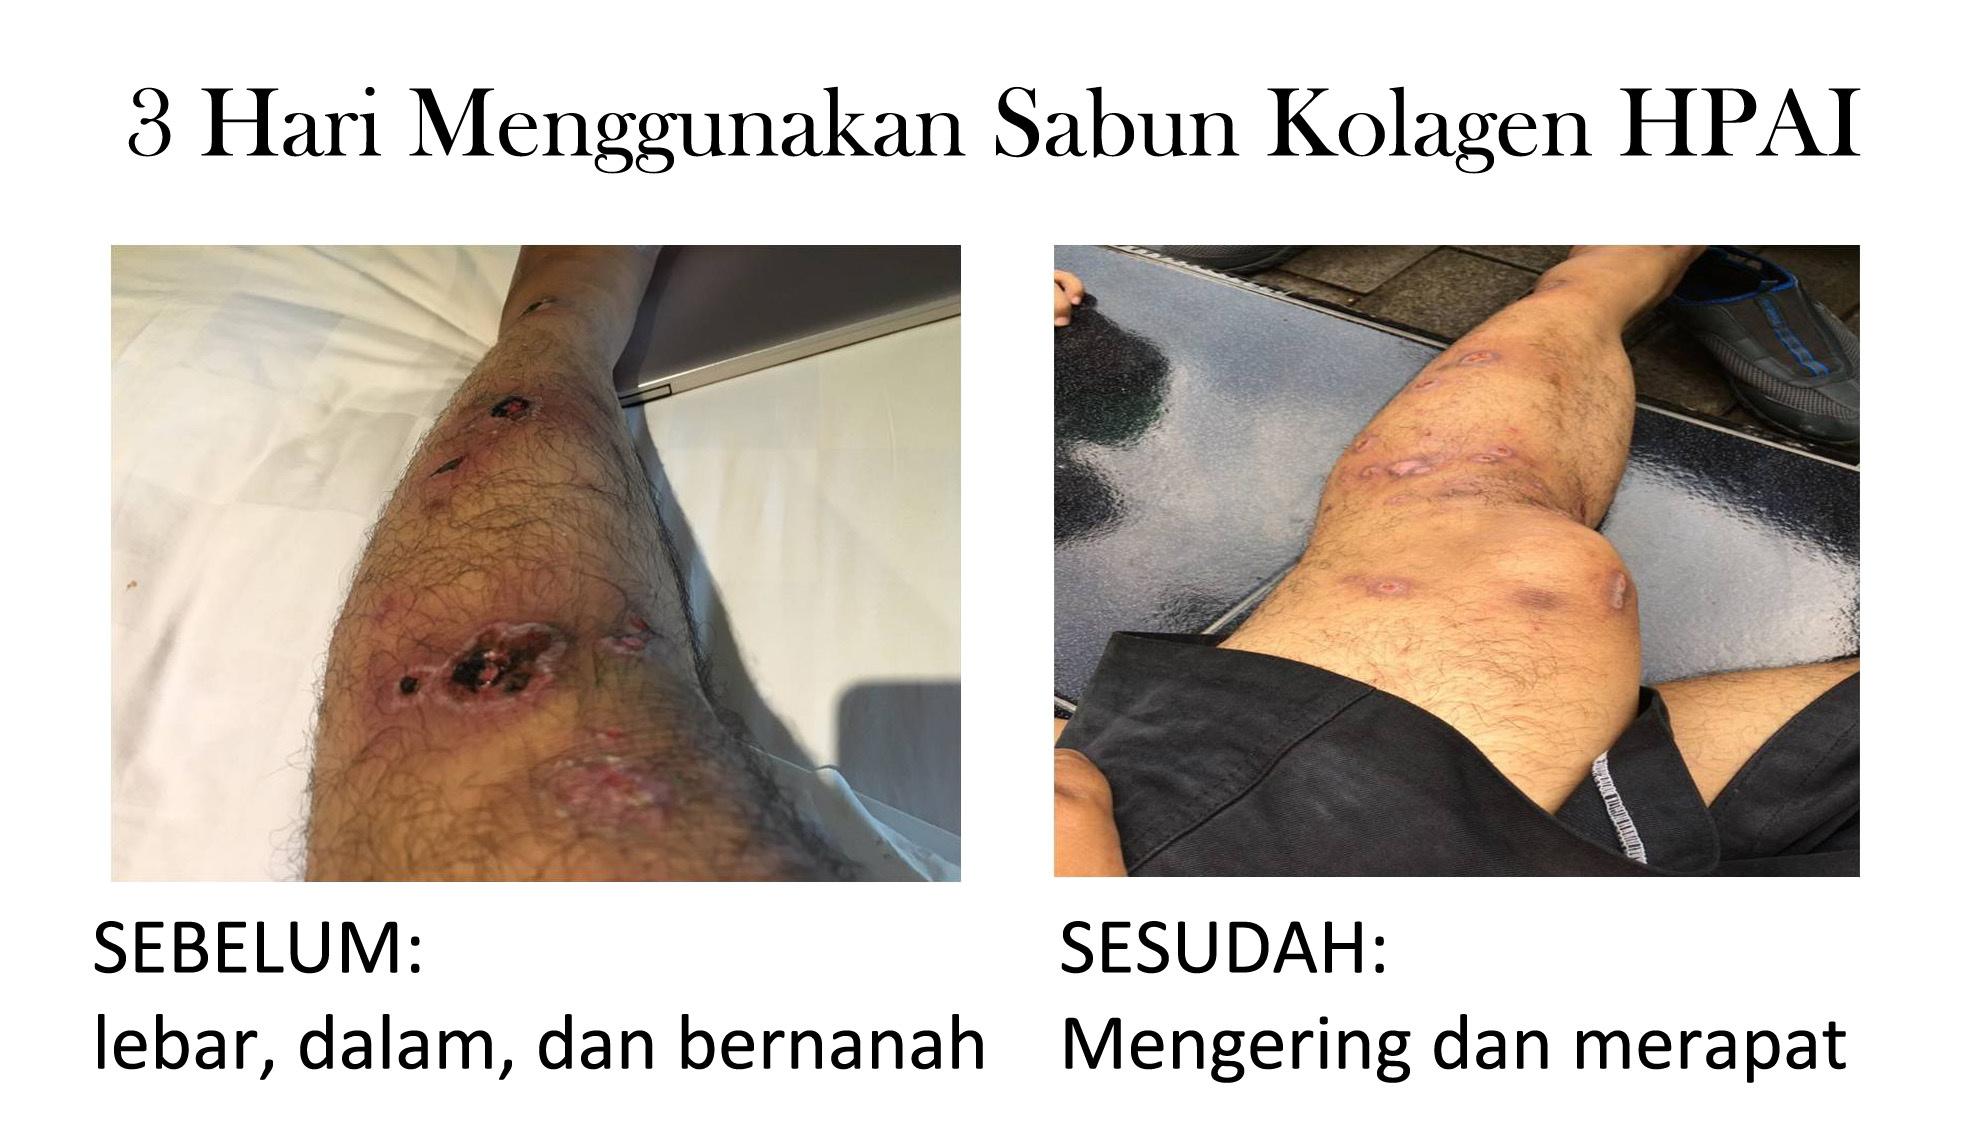 Testimoni sabun kolagen hpai Murah Surabaya